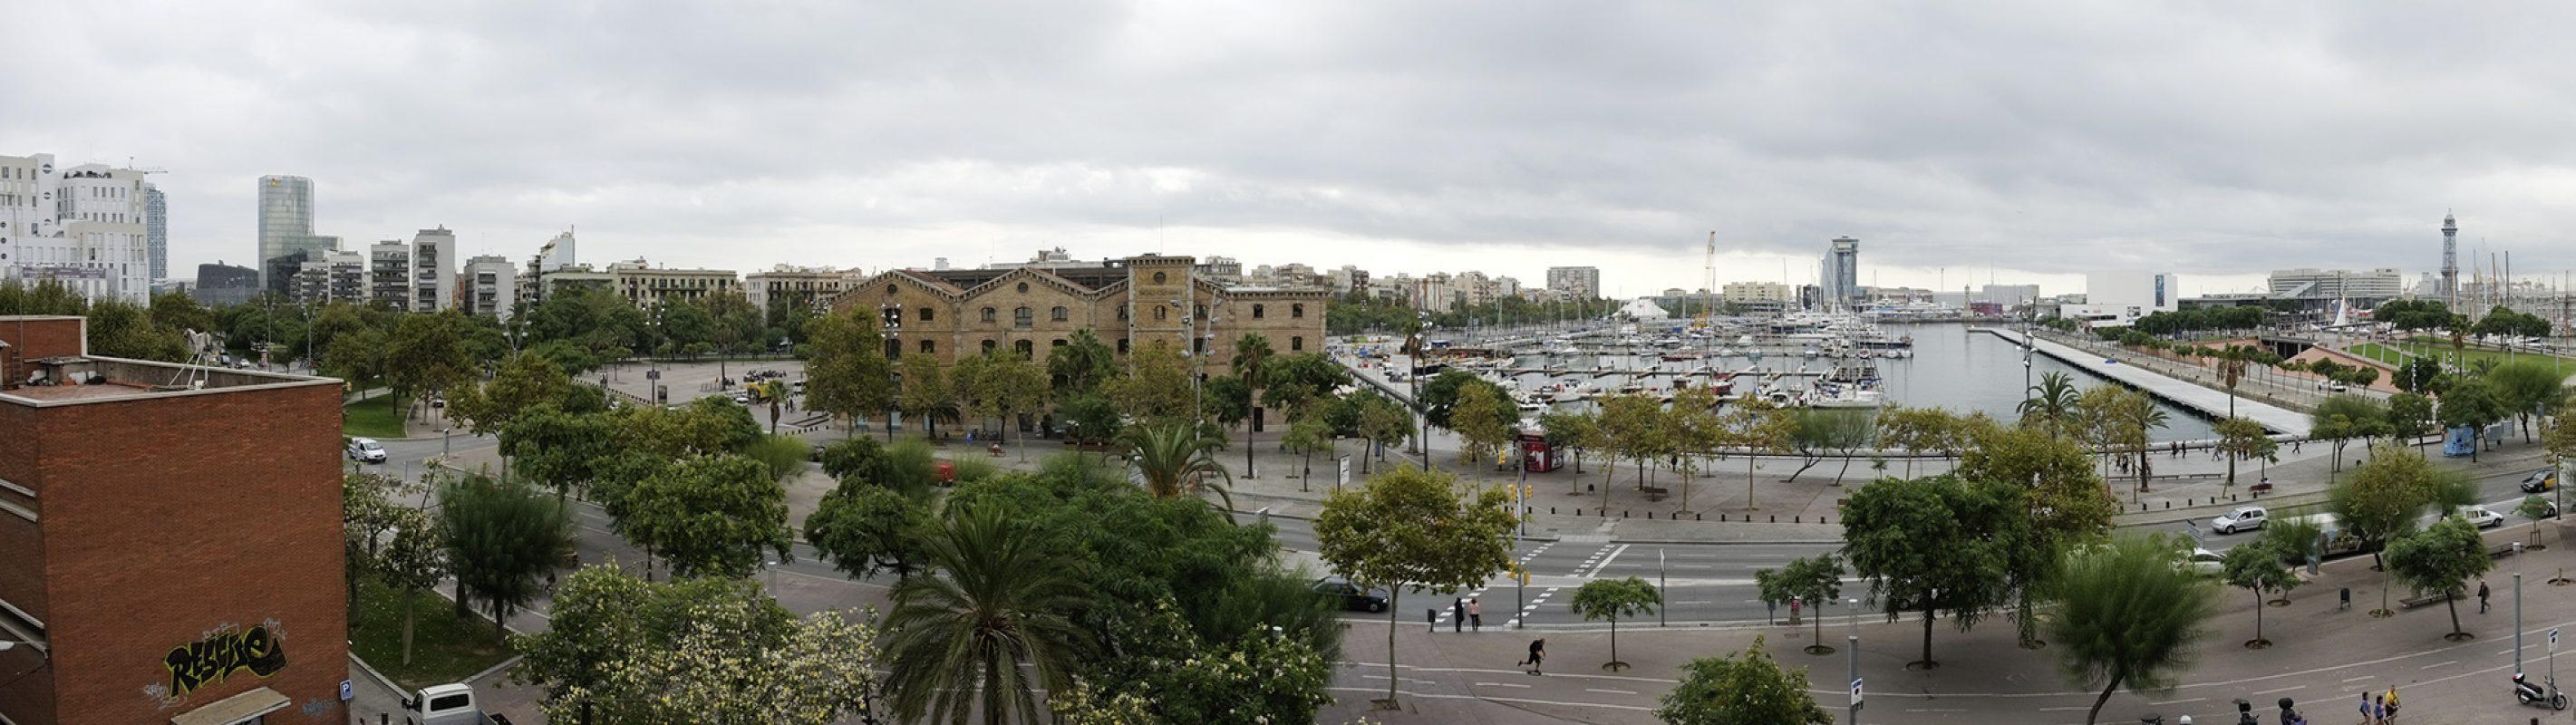 Barcelona, Panorama, Hafen